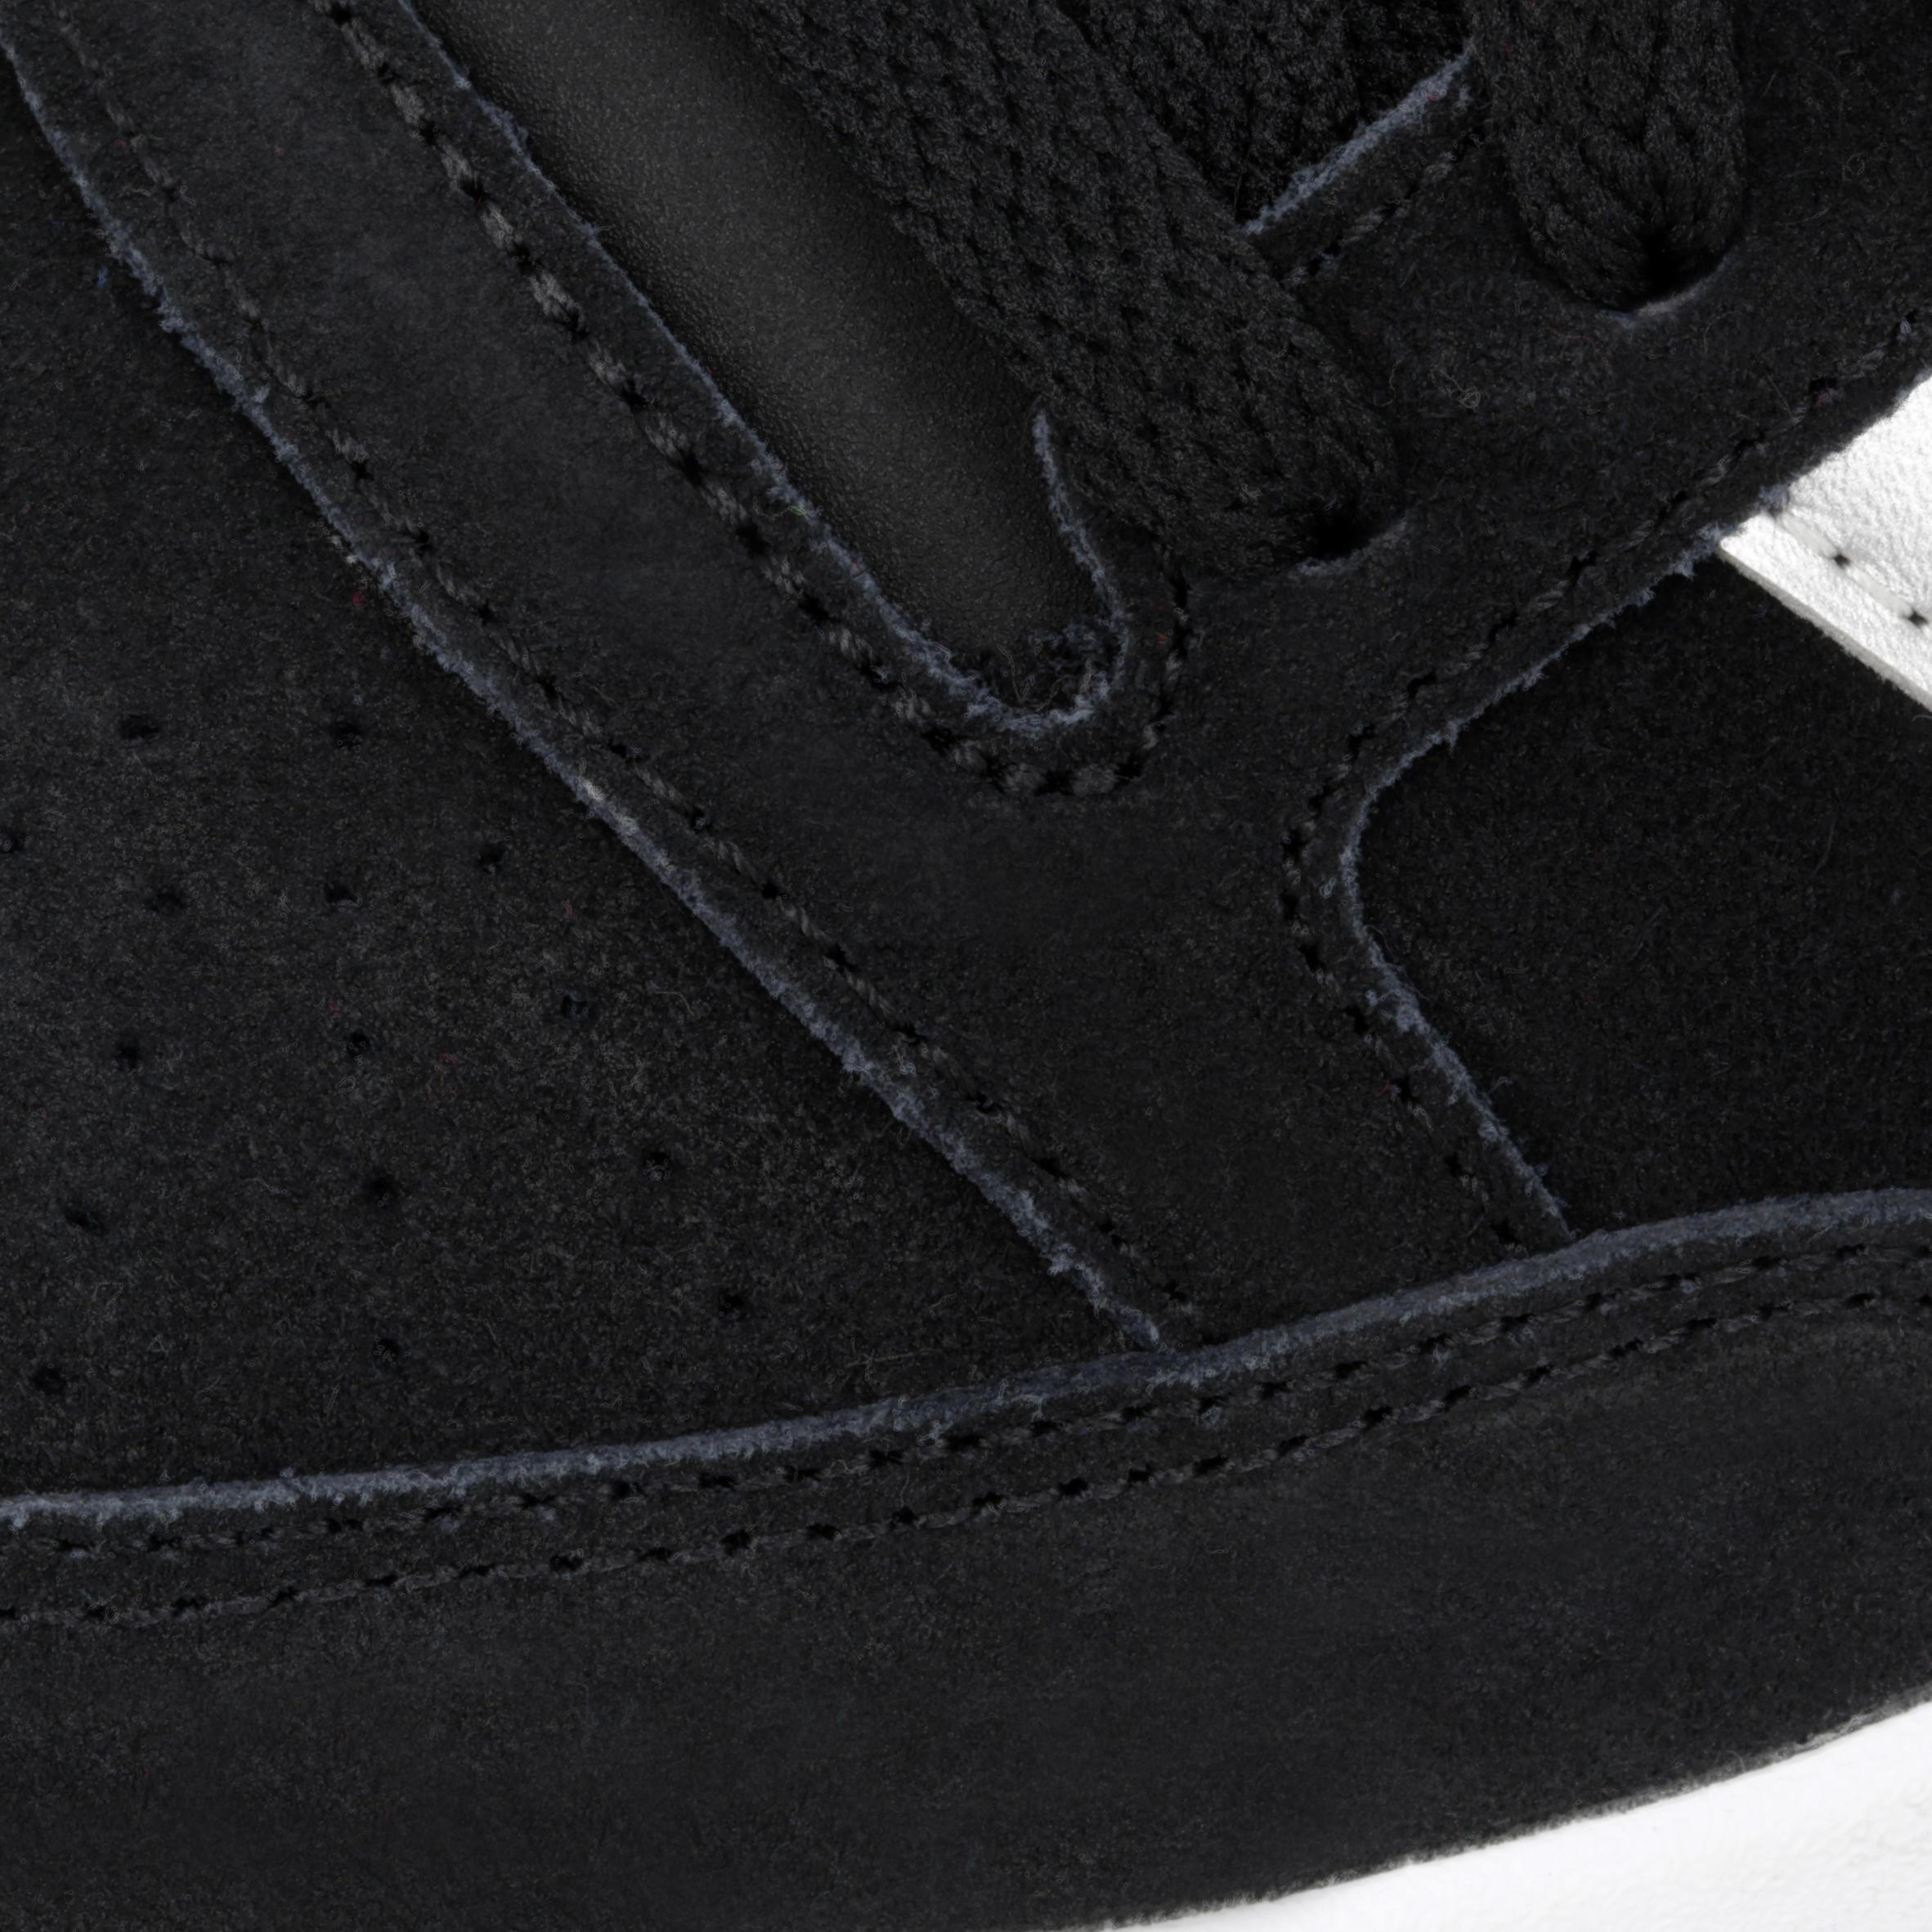 Tennis De Hoops Adidas Noir Femme Neo Nmw8n0 Chaussures EHY2e9DbWI